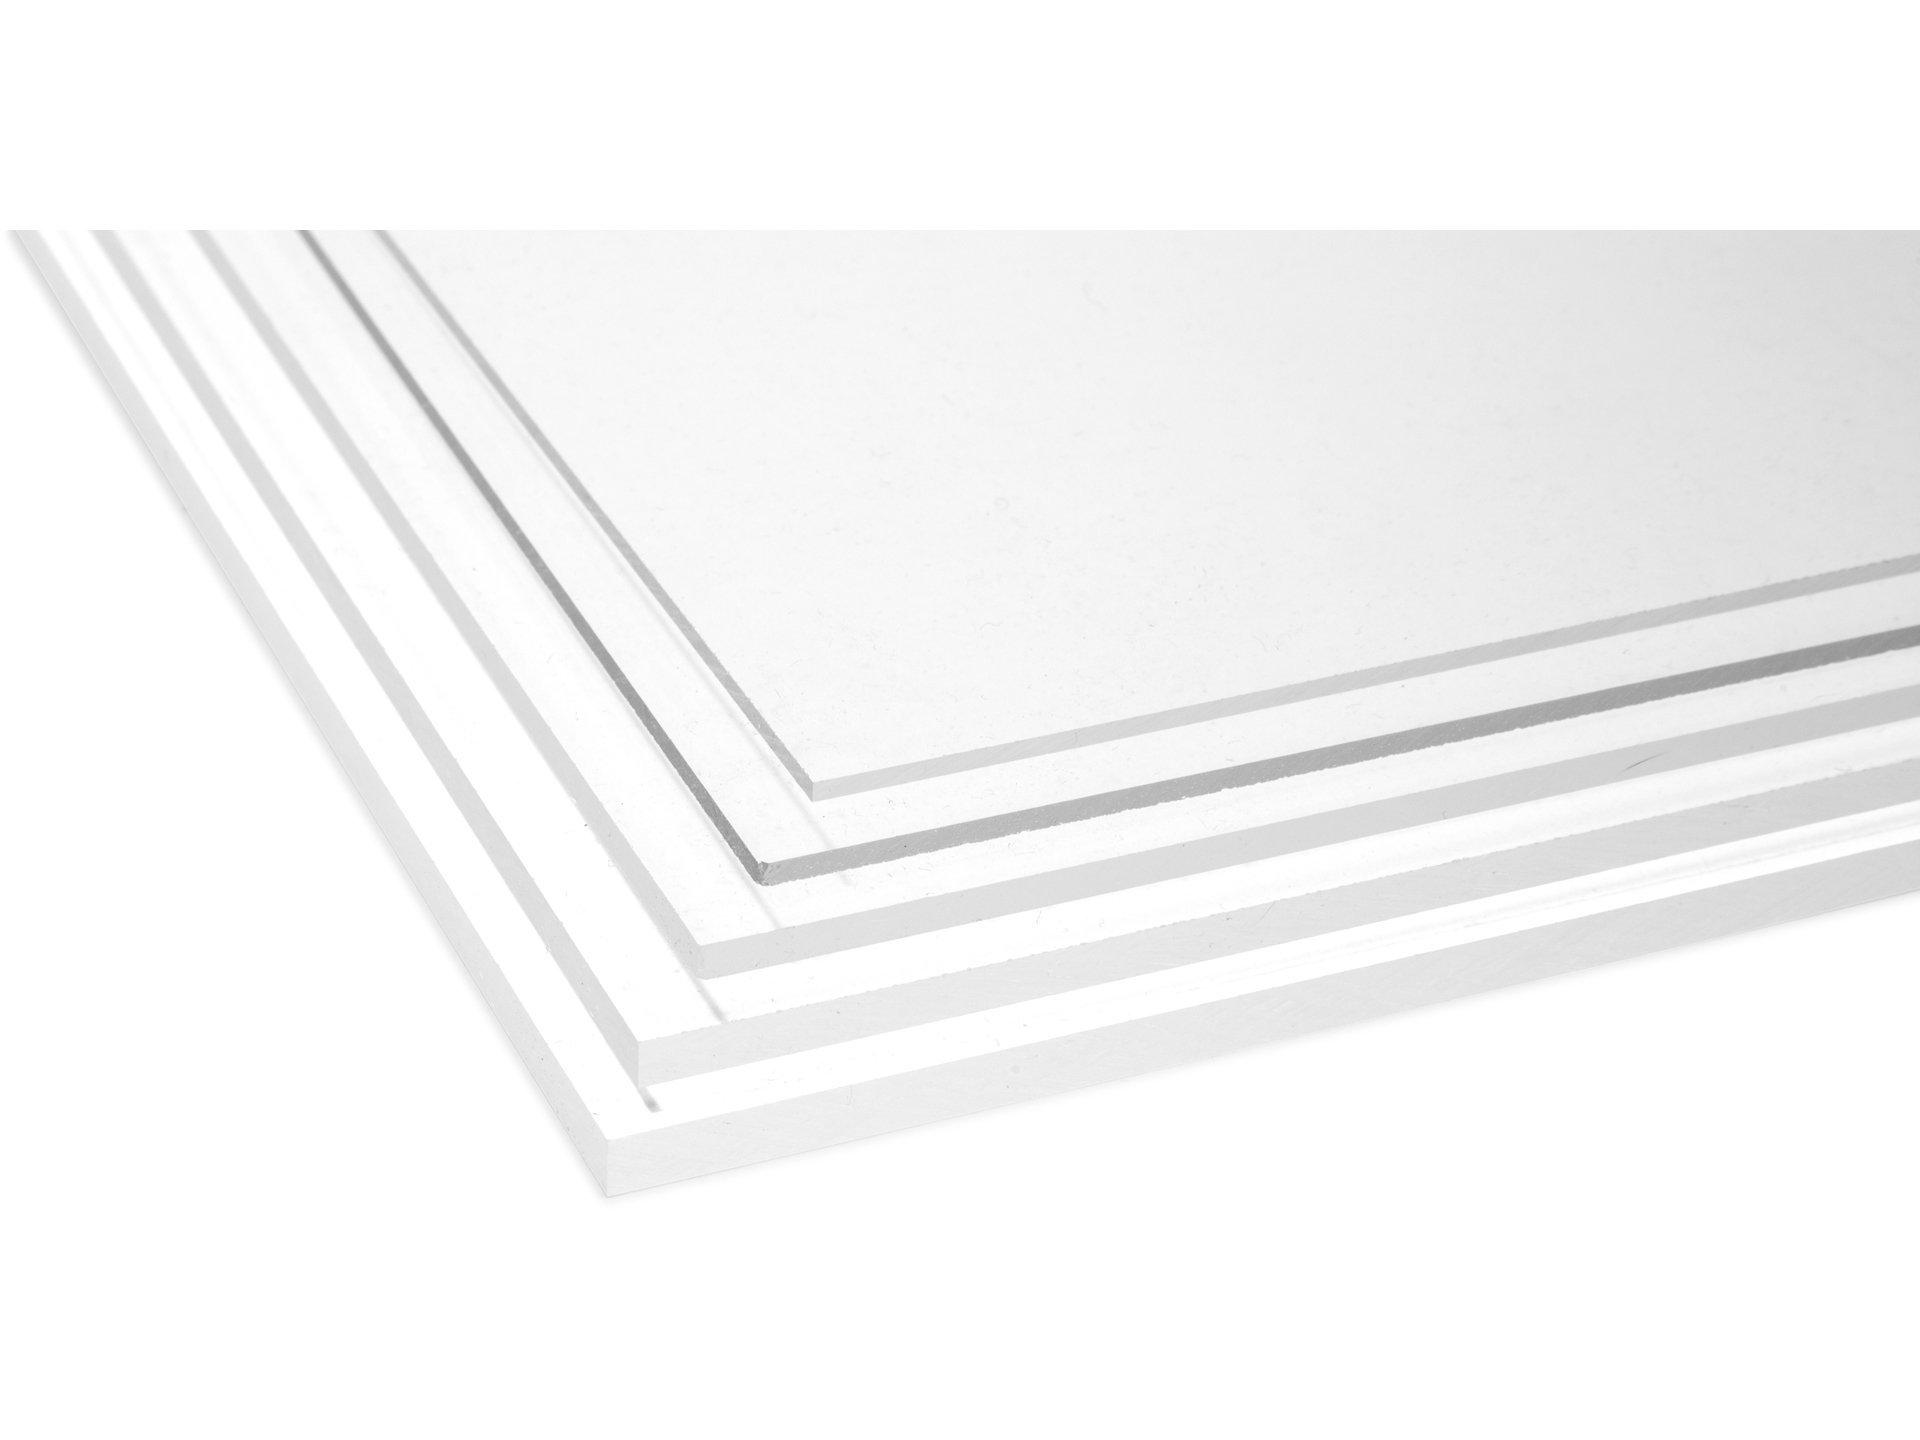 Spiegel aus Acrylglas XT Platte Zuschnitt silber 1000 x 600 x 3 mm